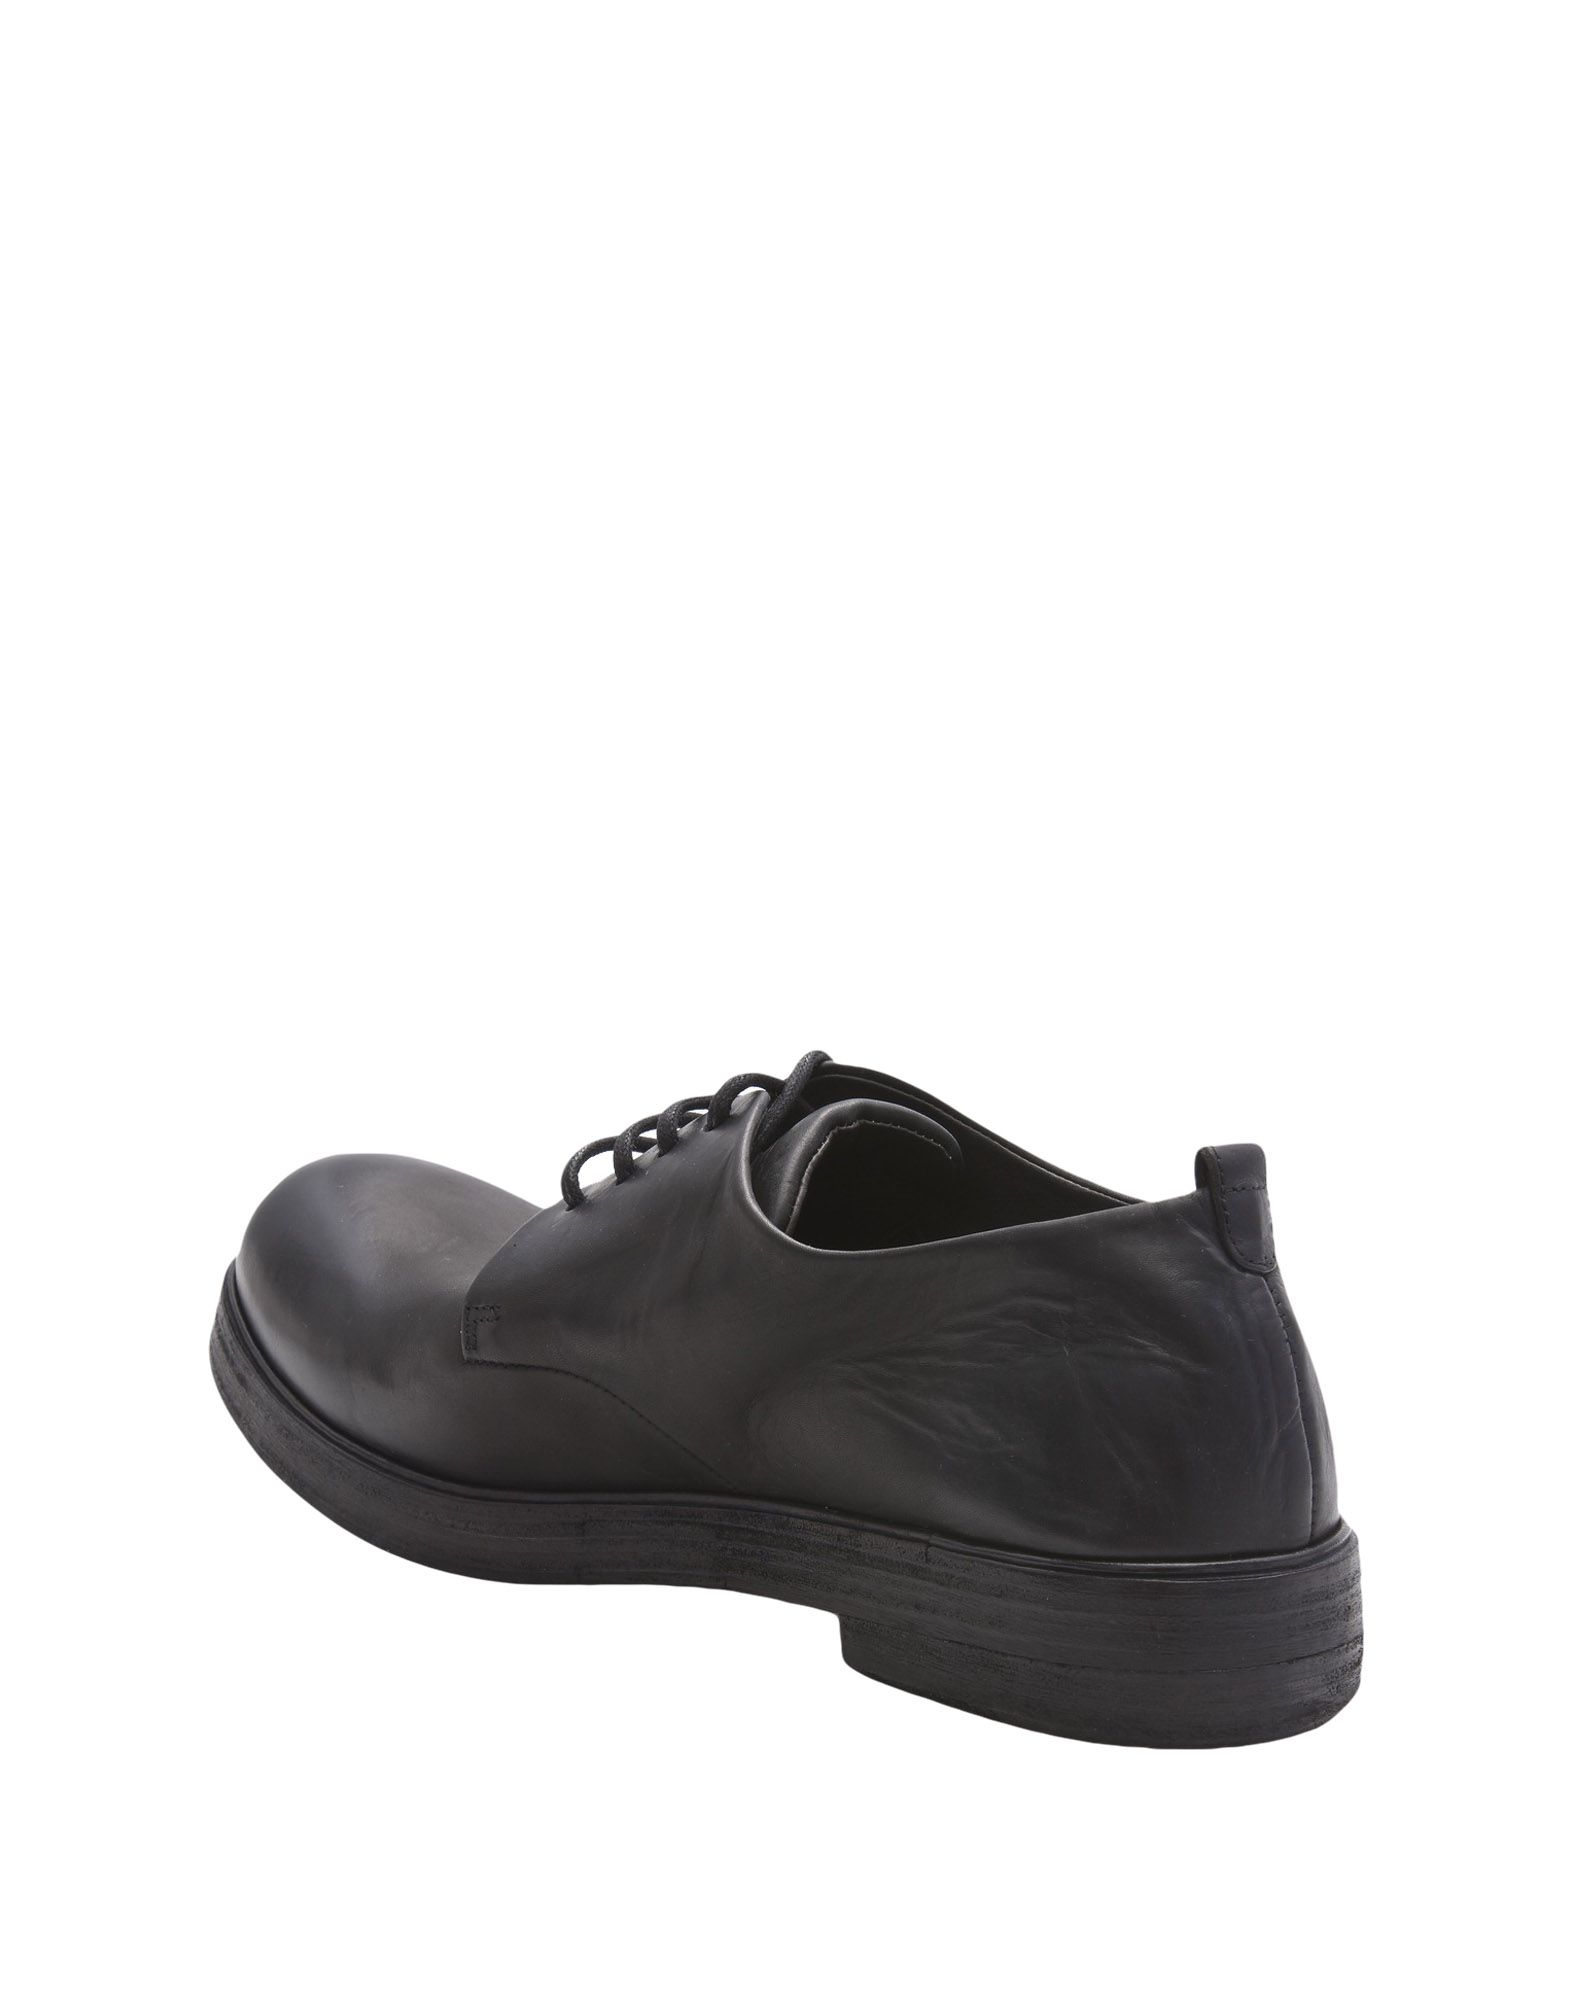 Marsèll Schuhe Schnürschuhe Herren  11524613SC Heiße Schuhe Marsèll ef79c1